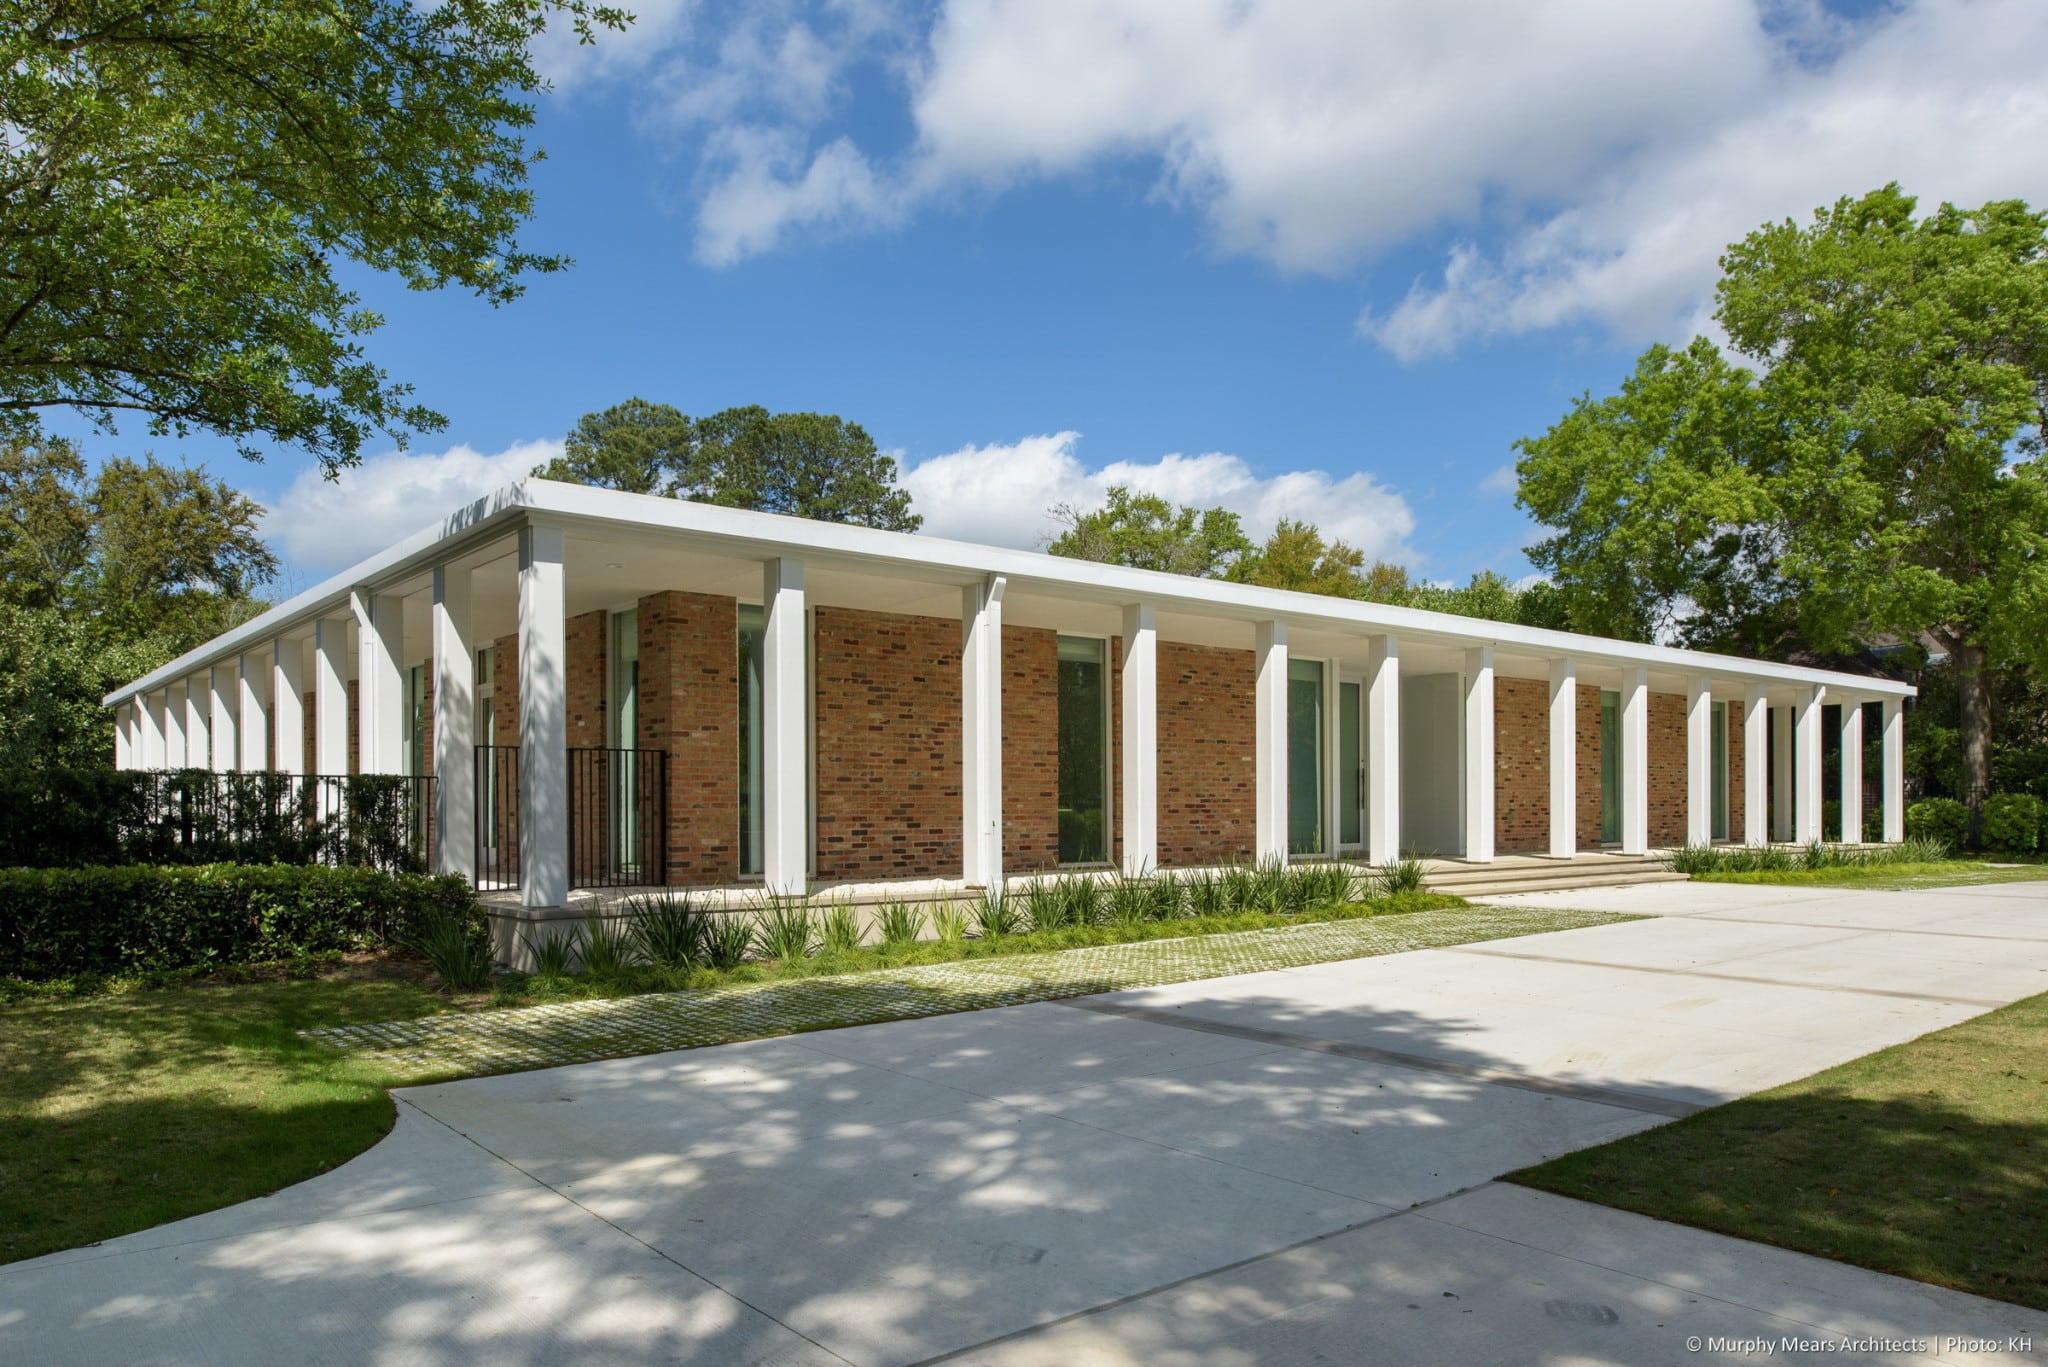 w-mid-century-modern-home-neuhaus-harwood-taylor-renovation-grass-pavers-autocourt.jpg